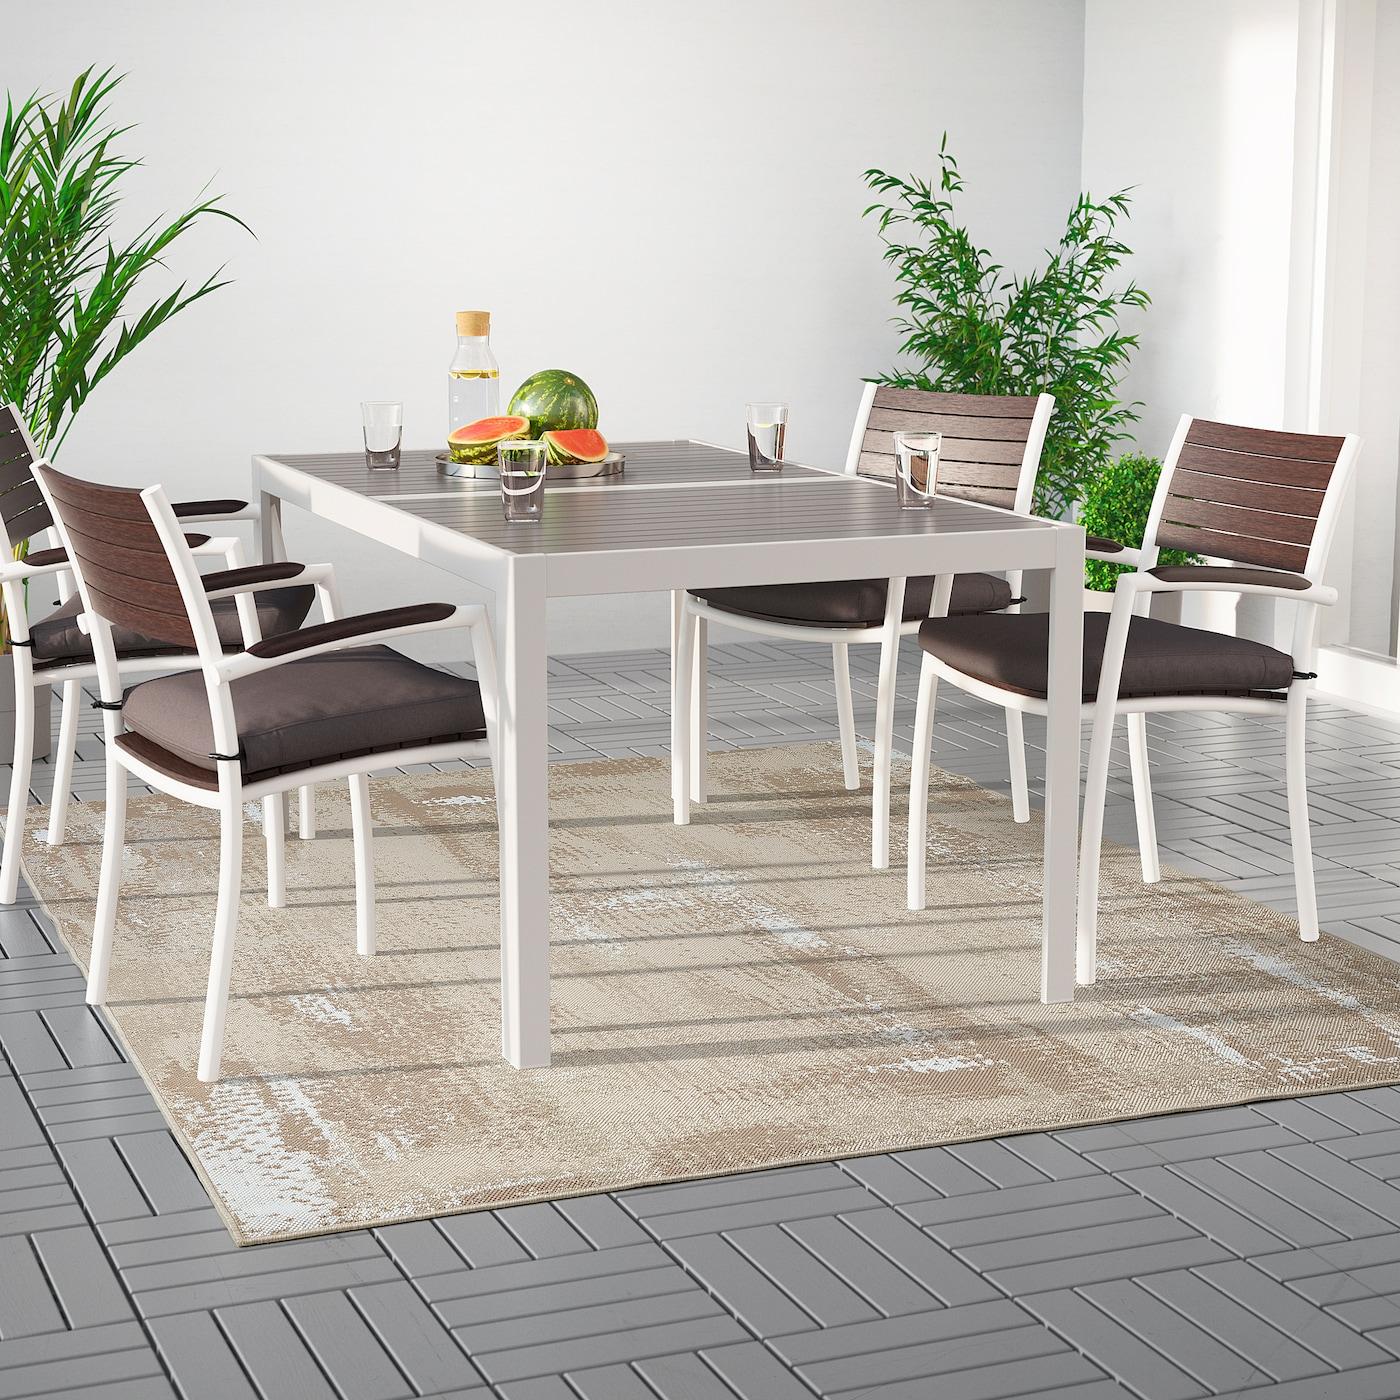 Rodelund Tappeto Tessitura Piatta Int Est Beige 200x250 Cm Ikea Svizzera